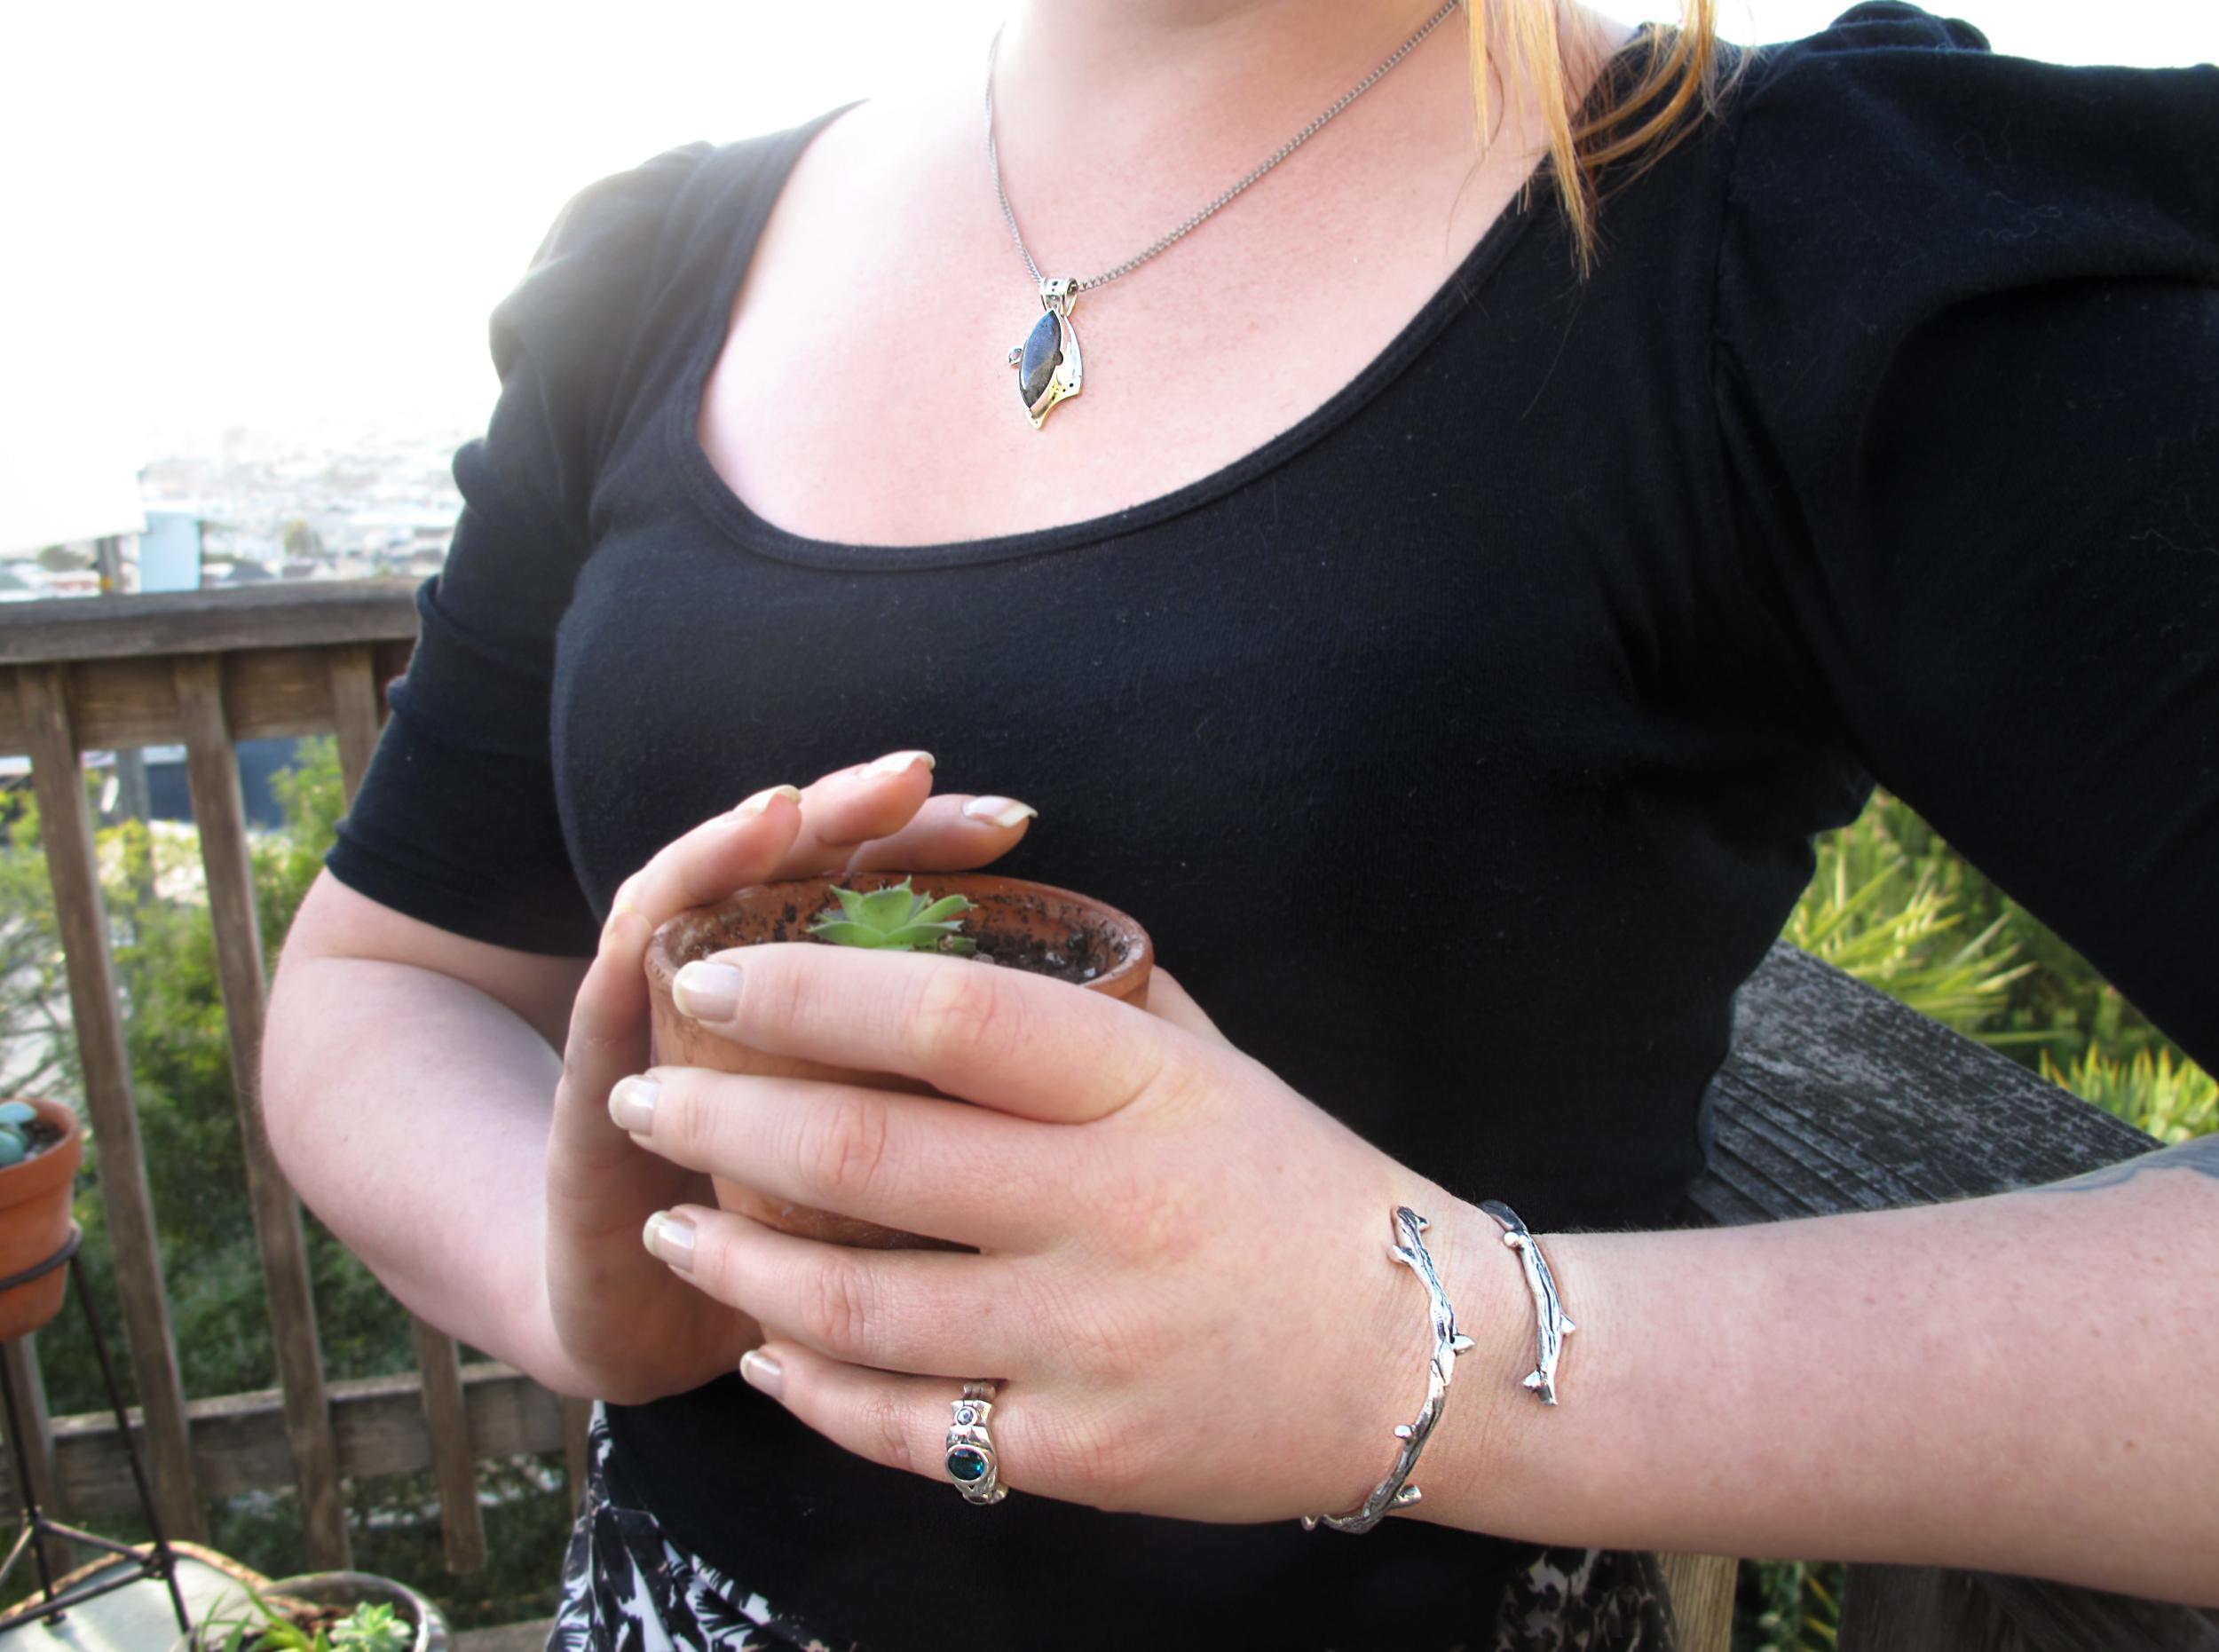 Labradorite Pendant,Ring, and cast sterling silver bracelet.  Model: Hilda Salokorpi  Photo: Nikki Nolan (thenikkinolan.com)